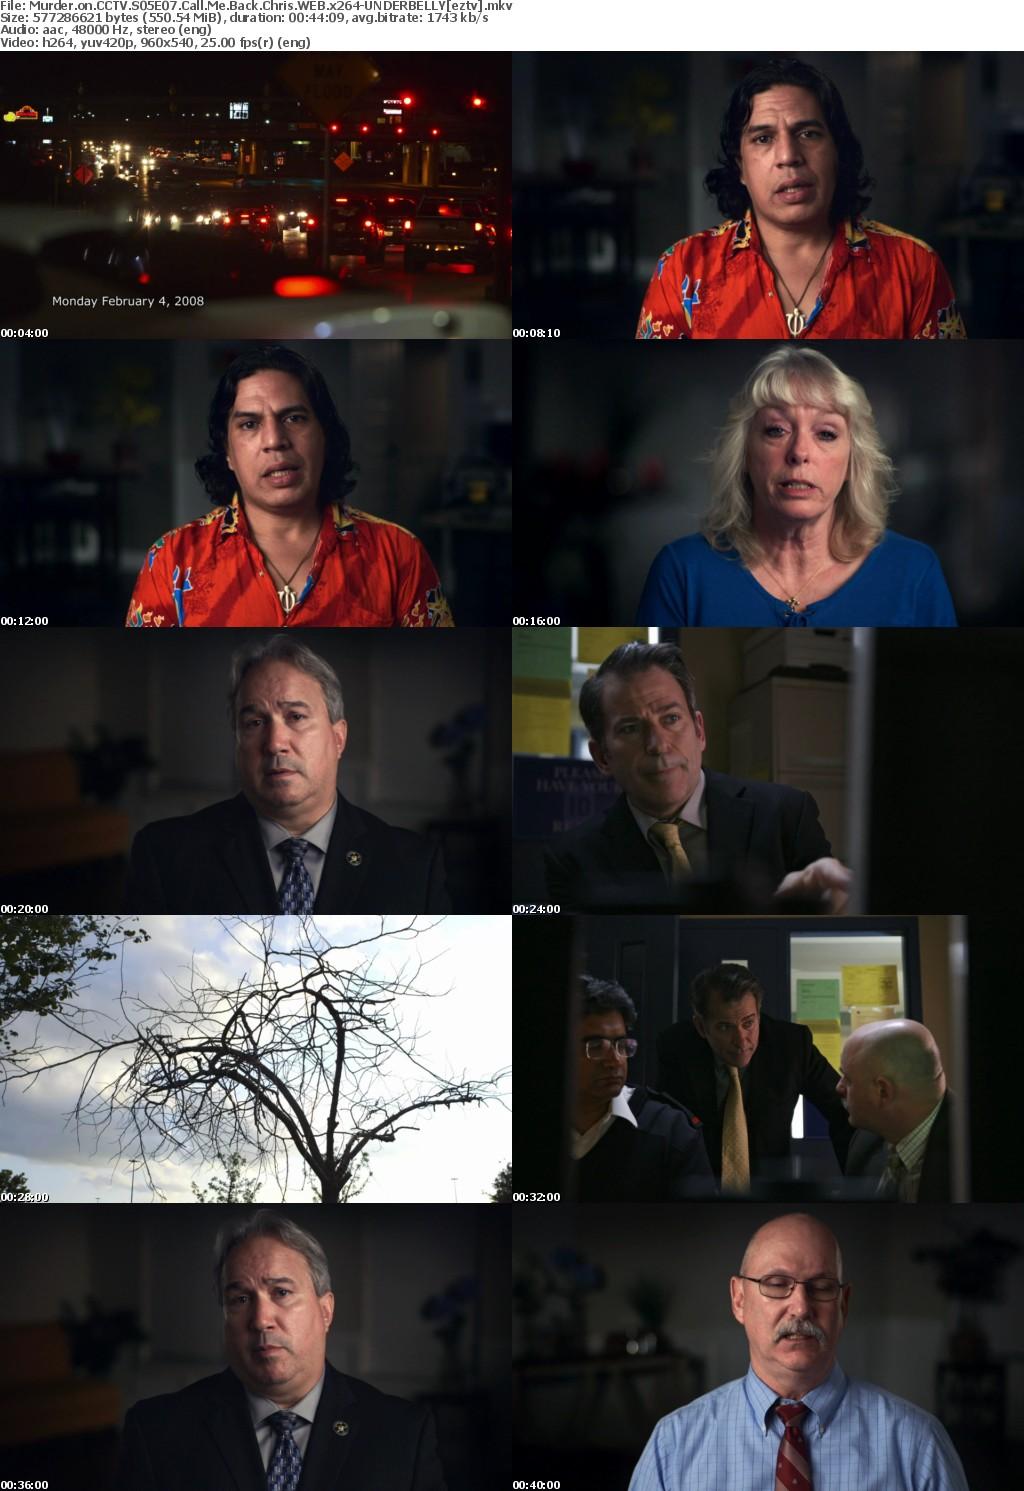 Murder on CCTV S05E07 Call Me Back Chris WEB x264 UNDERBELLY